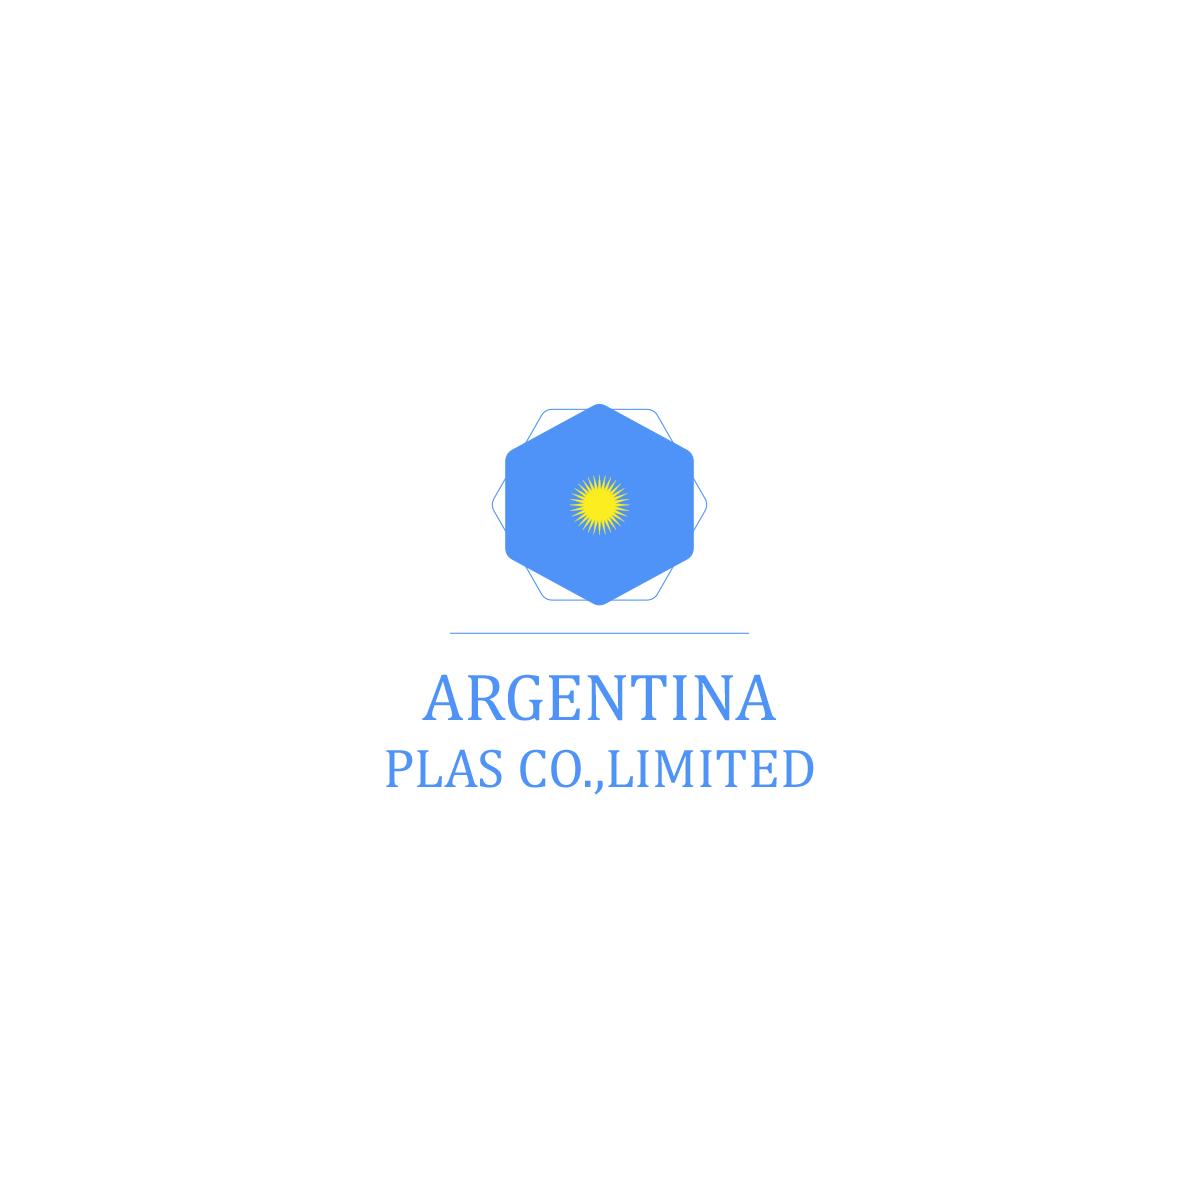 Argentina Plas Co.,Limited